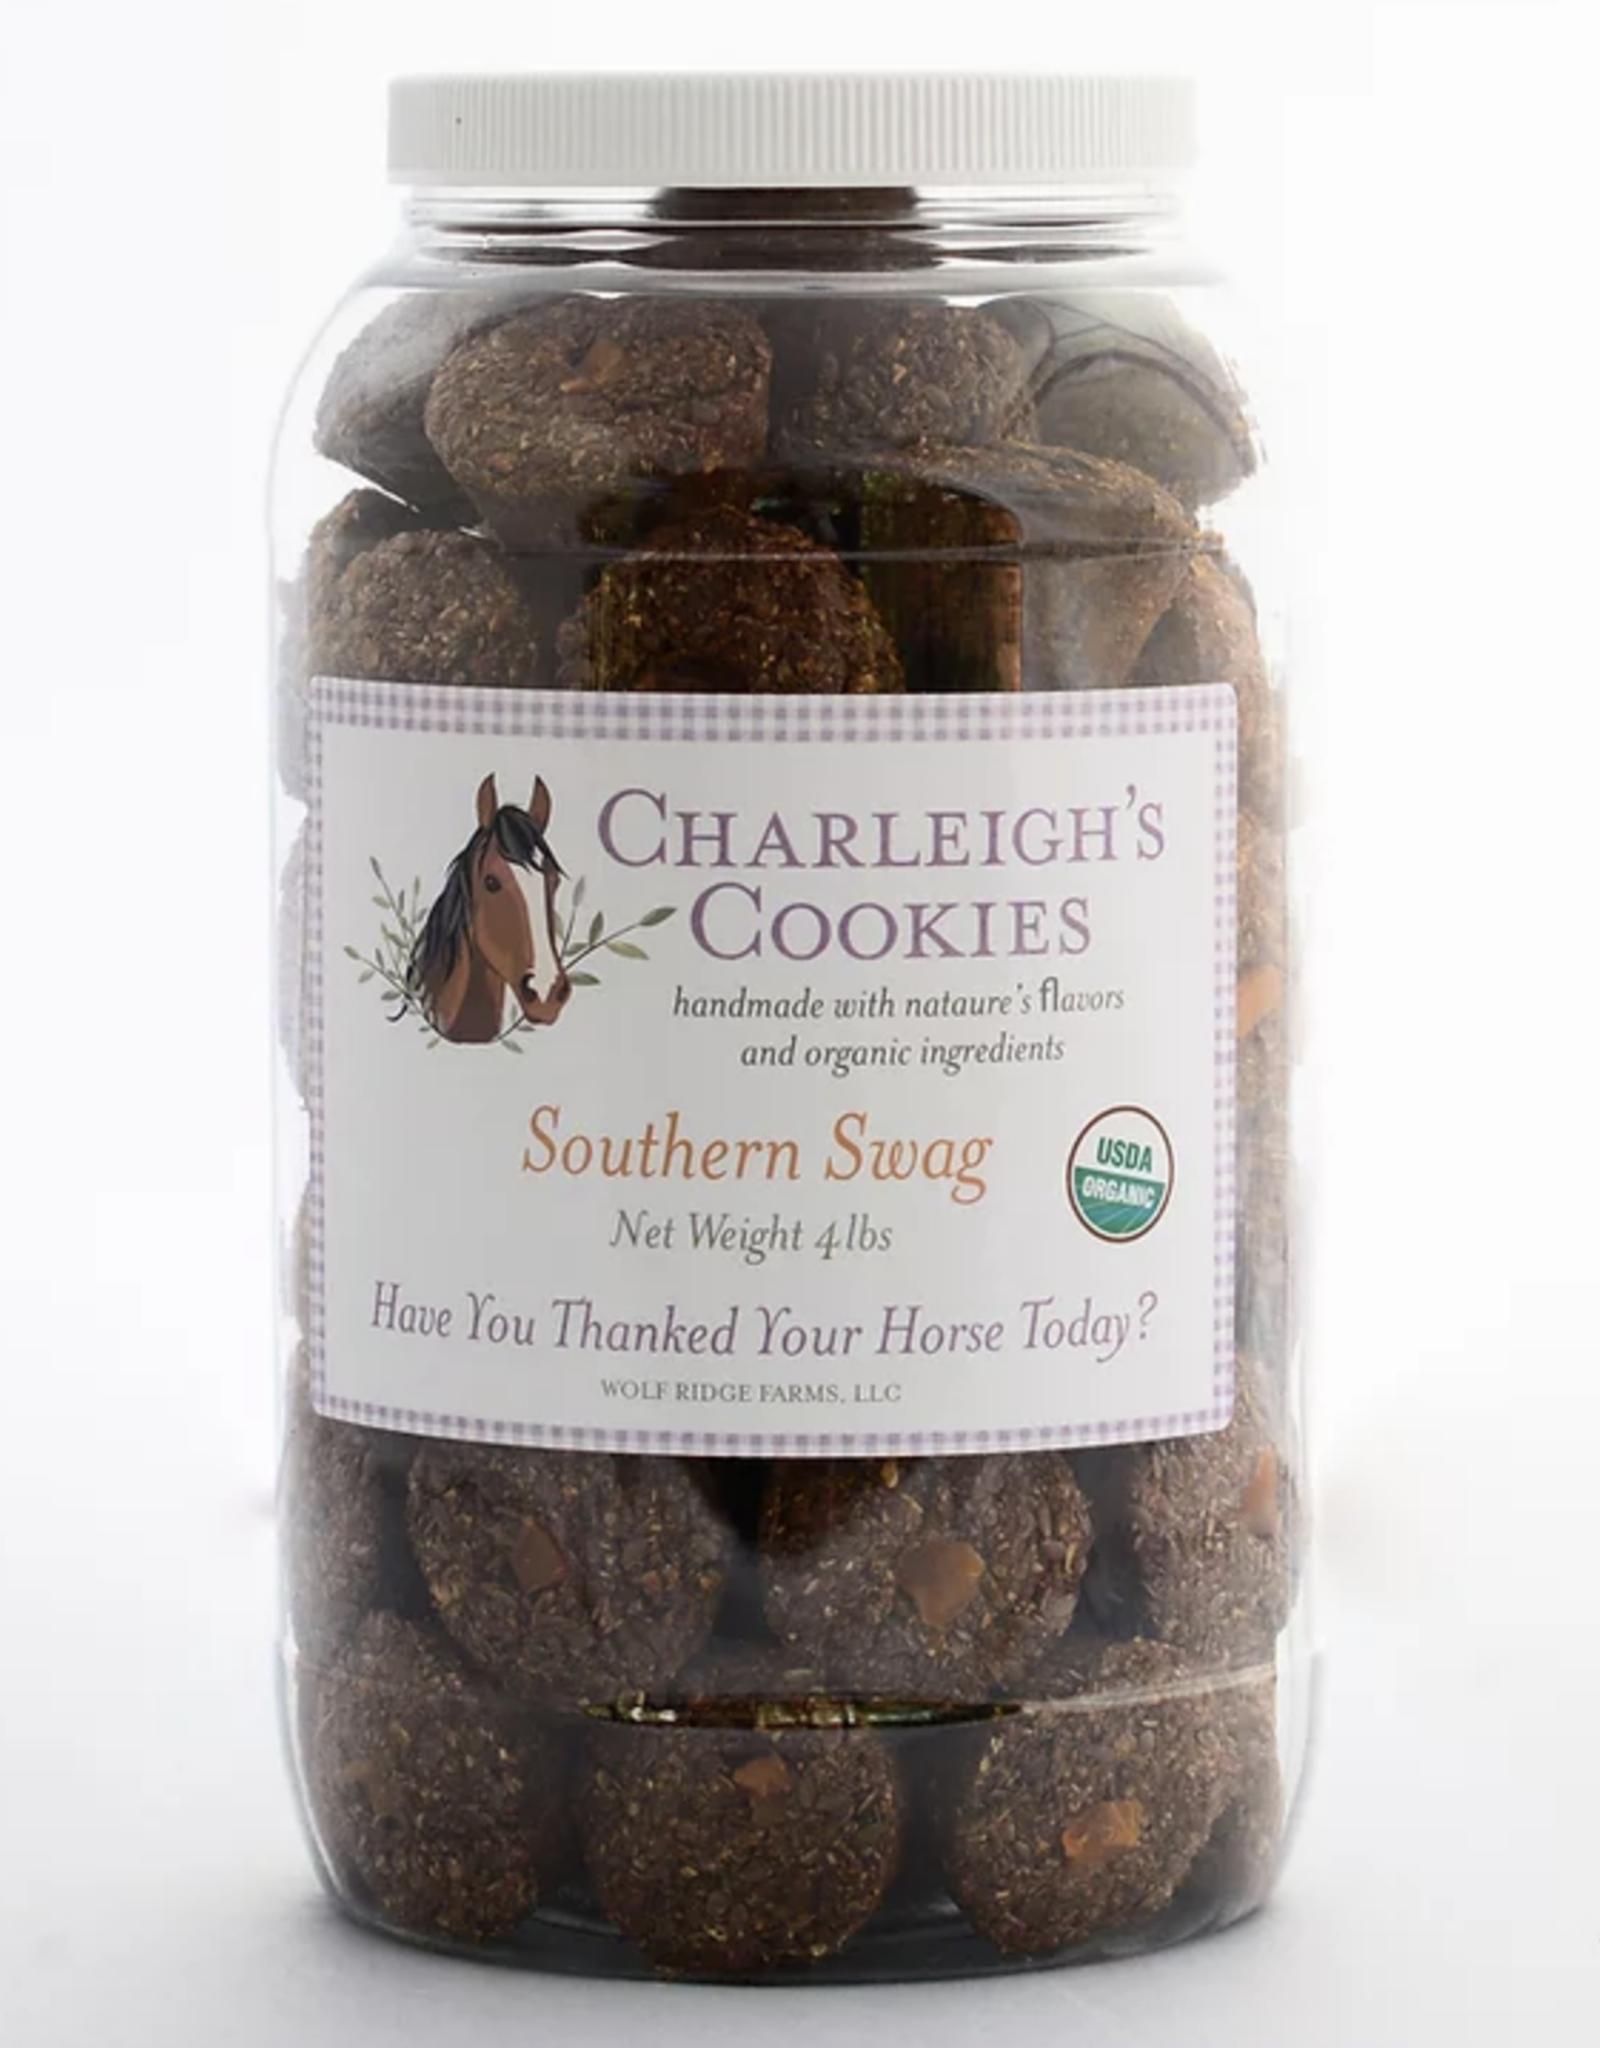 Charleigh's Cookies Charleigh's Cookies Southern Swag 4lb Cookie Jar